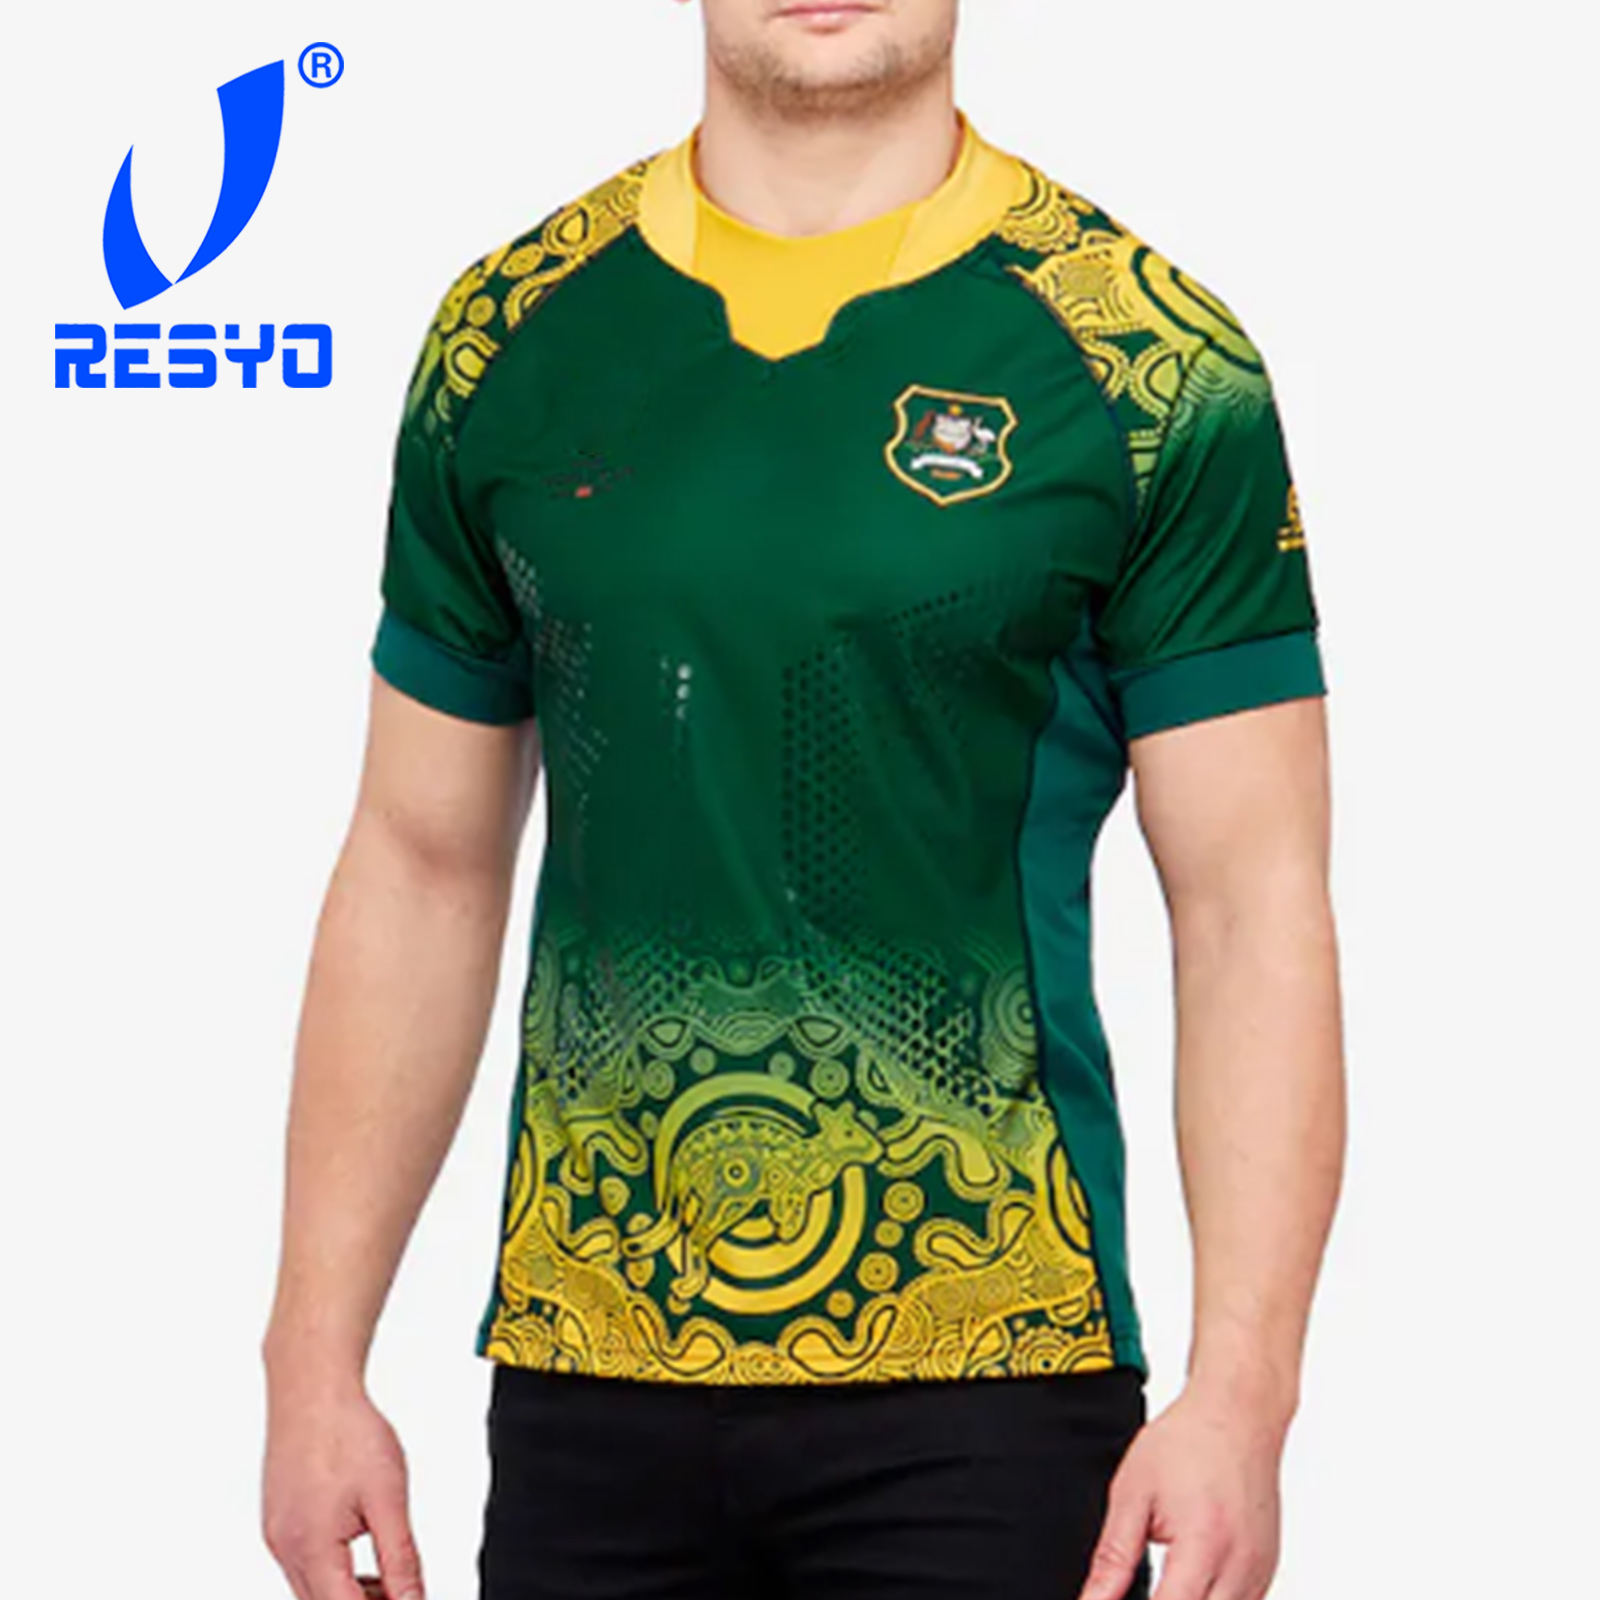 RESYO For Australia RWC19 Alternate Replica Shirt-Wallabies Green  Rugby Sport Jersey Size:S-5XL Free Shipping